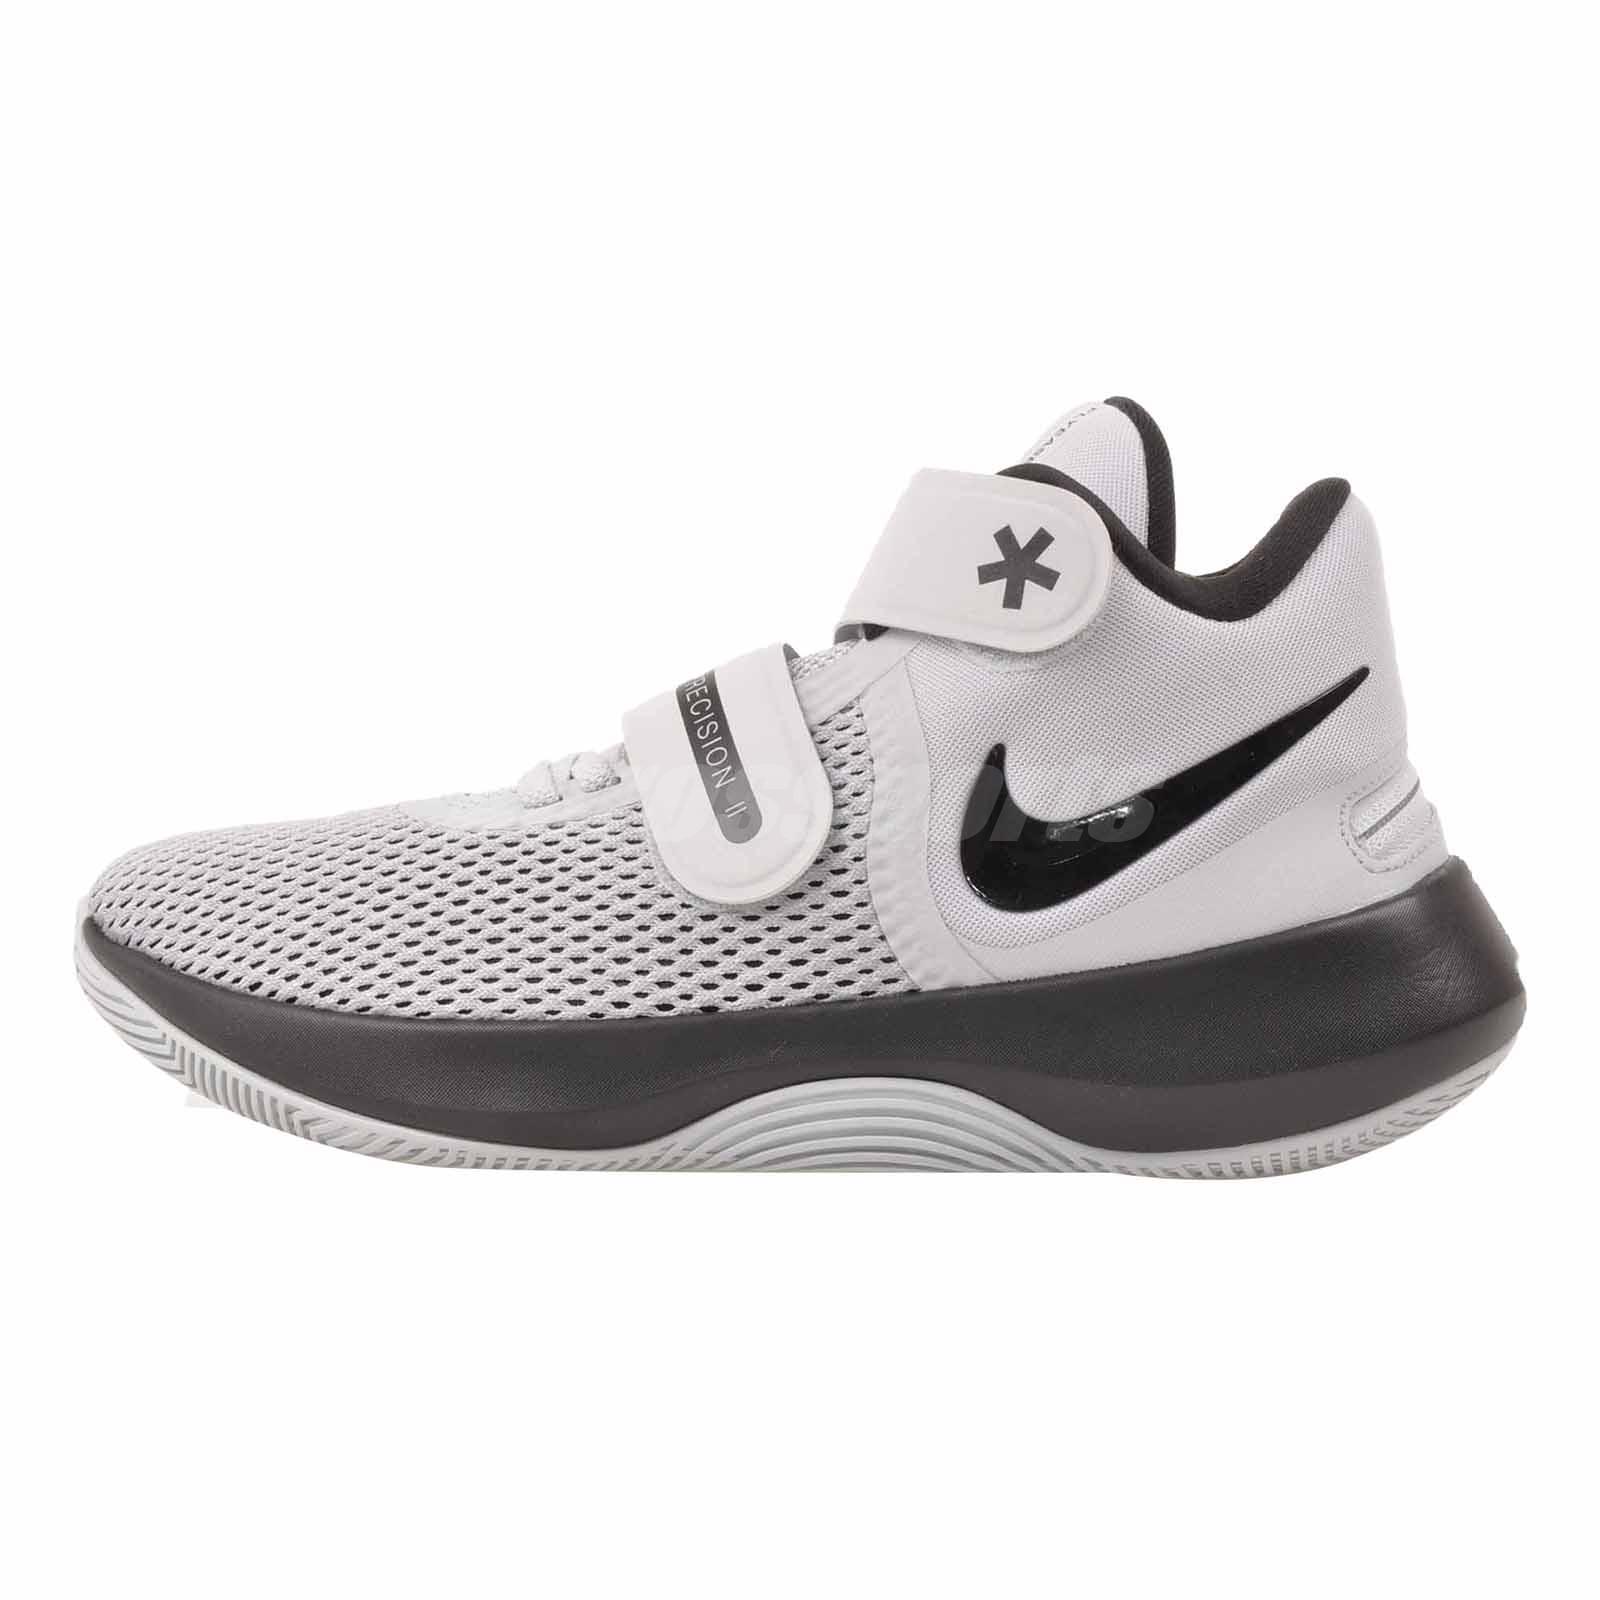 Nuevo Zapatillas Nike Air Precision II FlyEase Nike Mujer